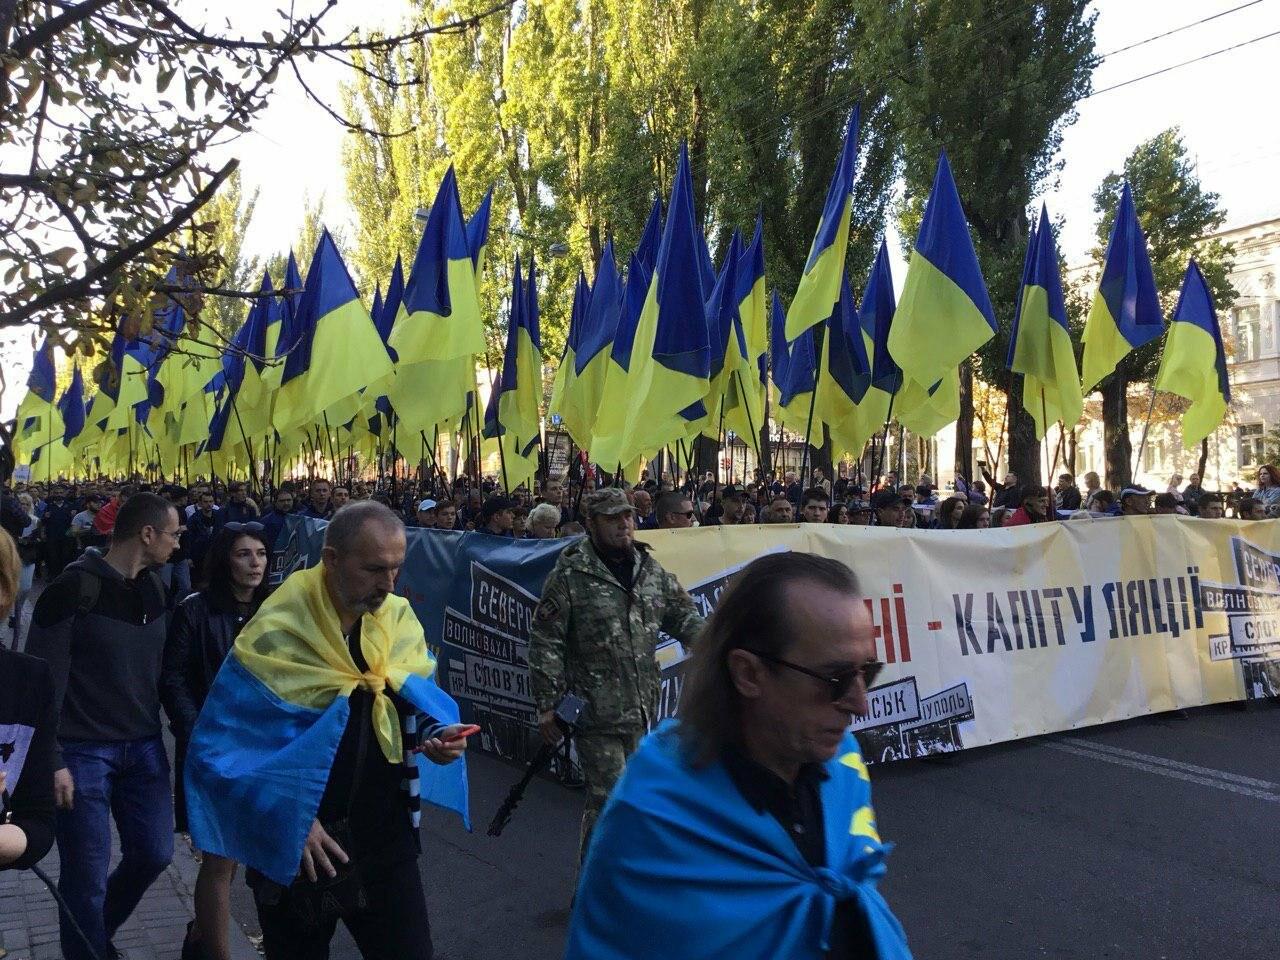 Криворожане поддержали Марш сопротивления капитуляции в Киеве, - ФОТО, ВИДЕО, ОБНОВЛЕНО, фото-9